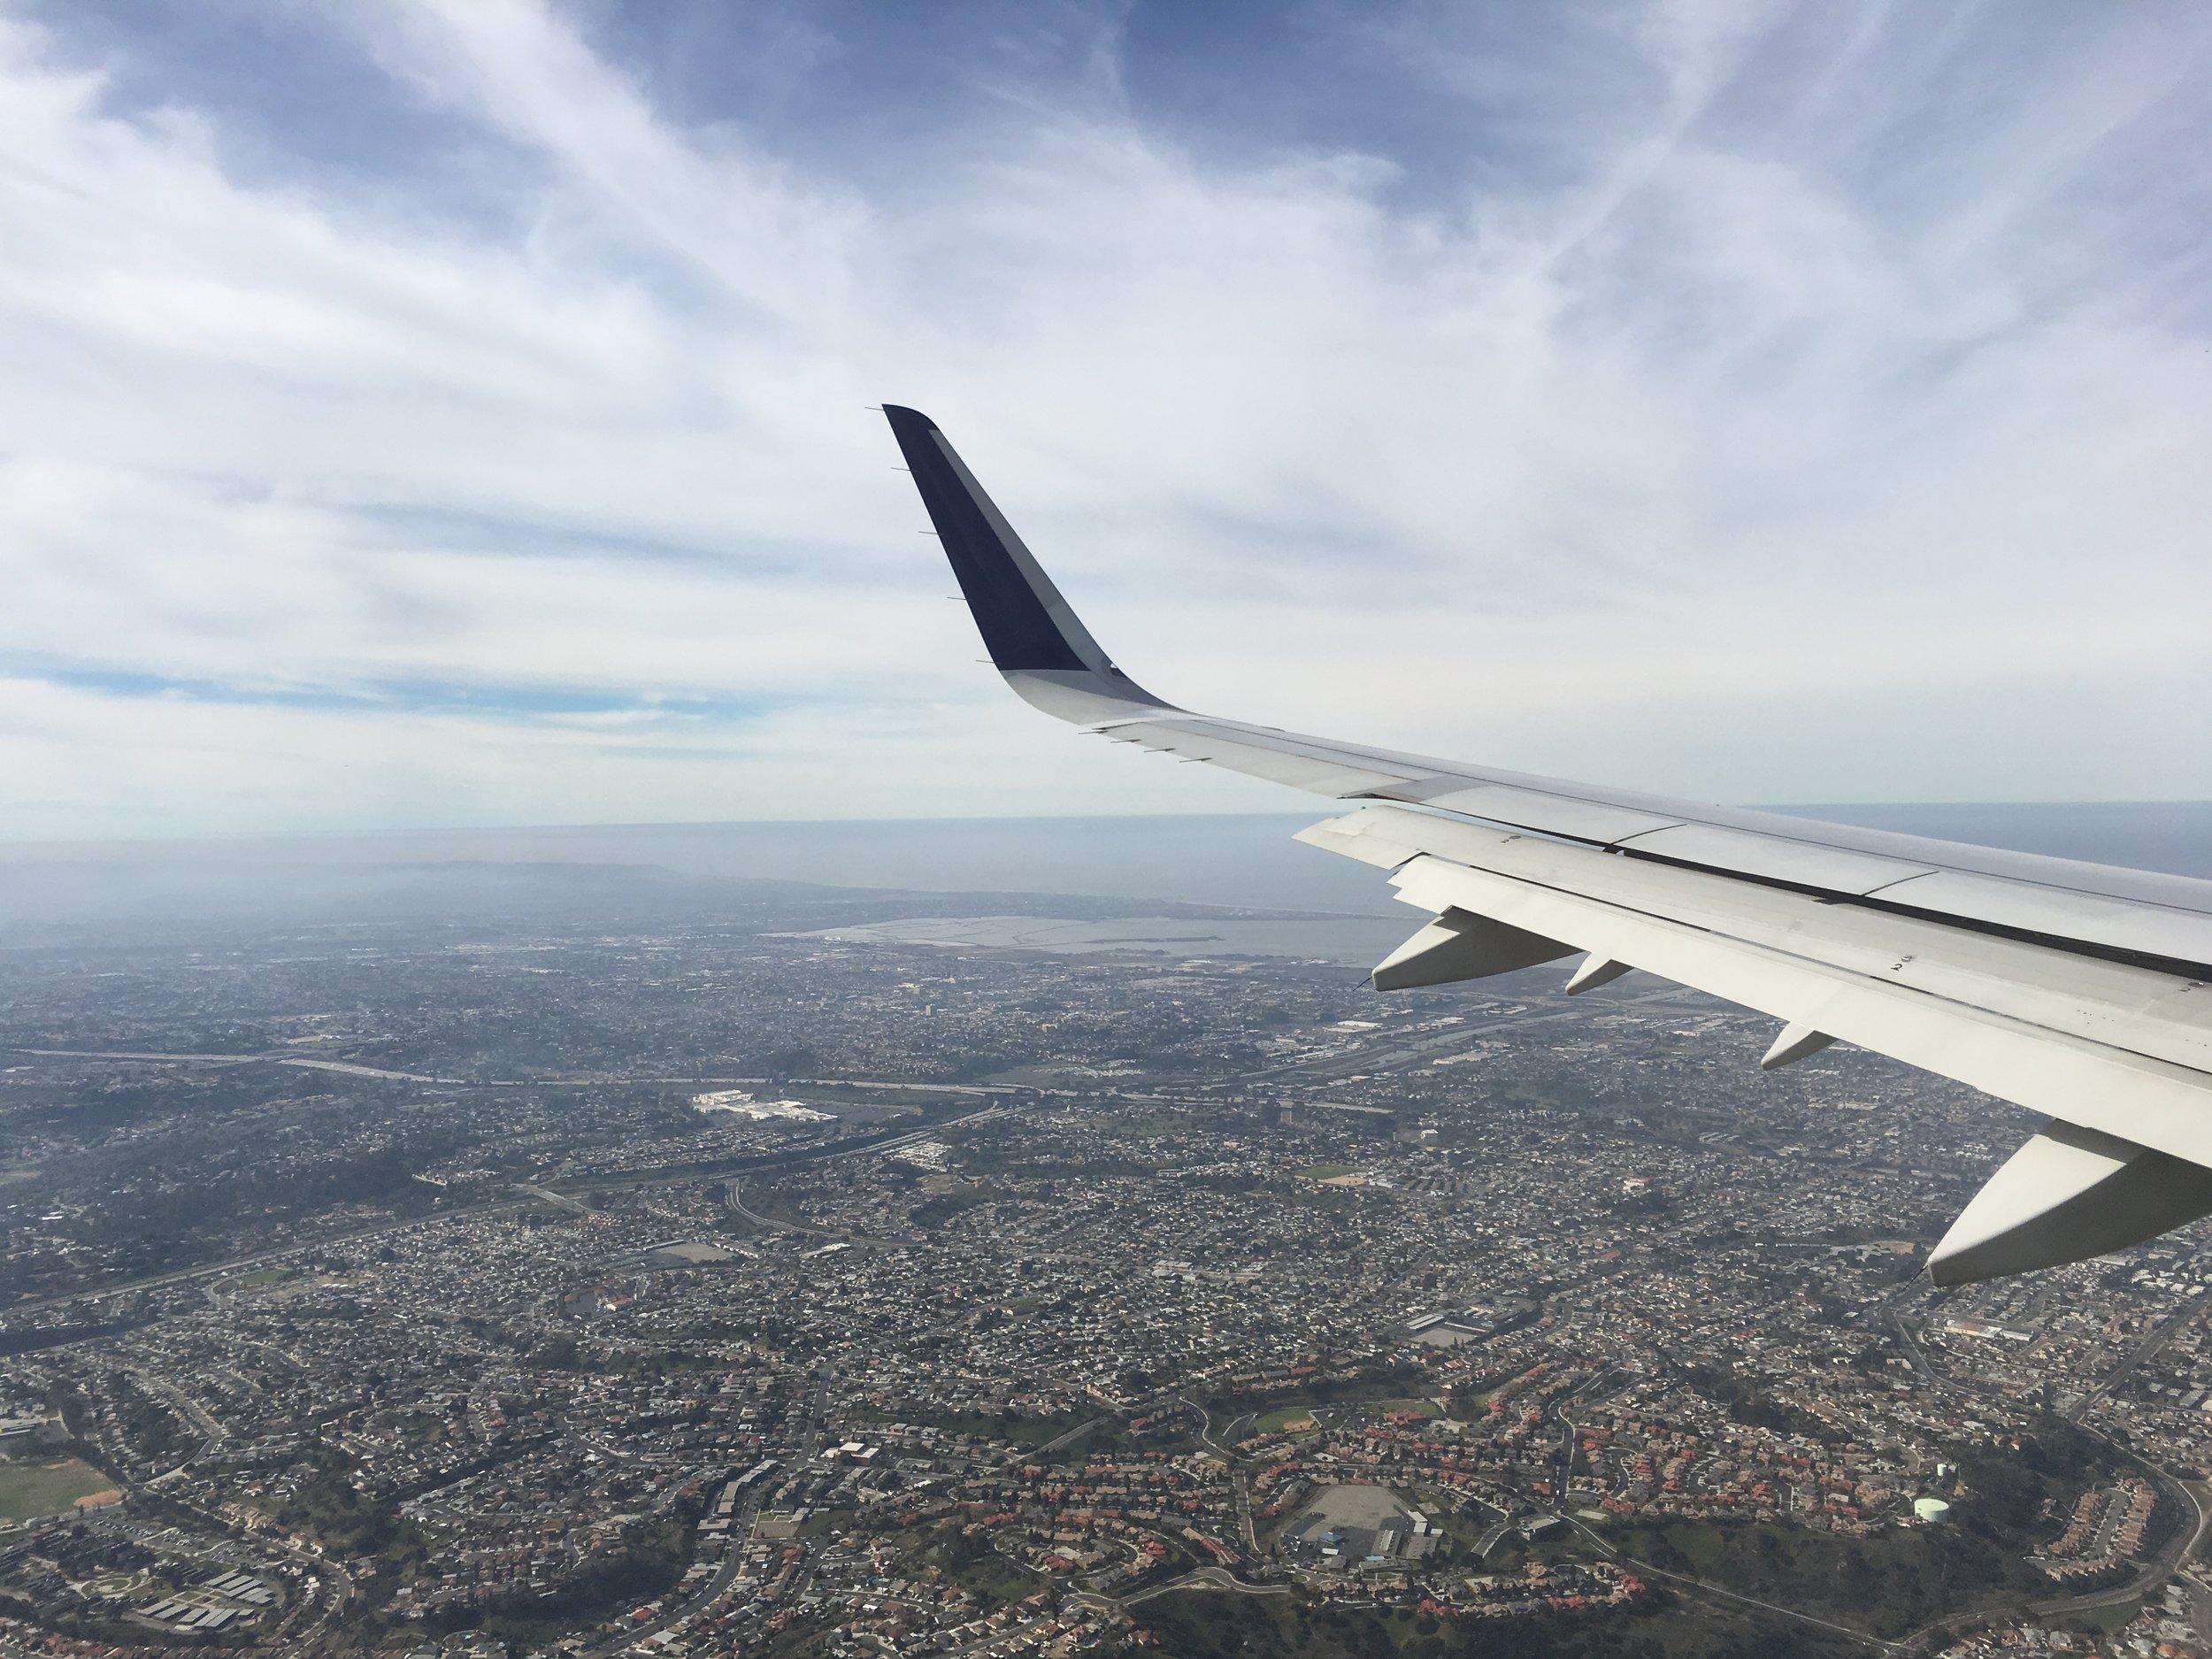 On my way to San Diego